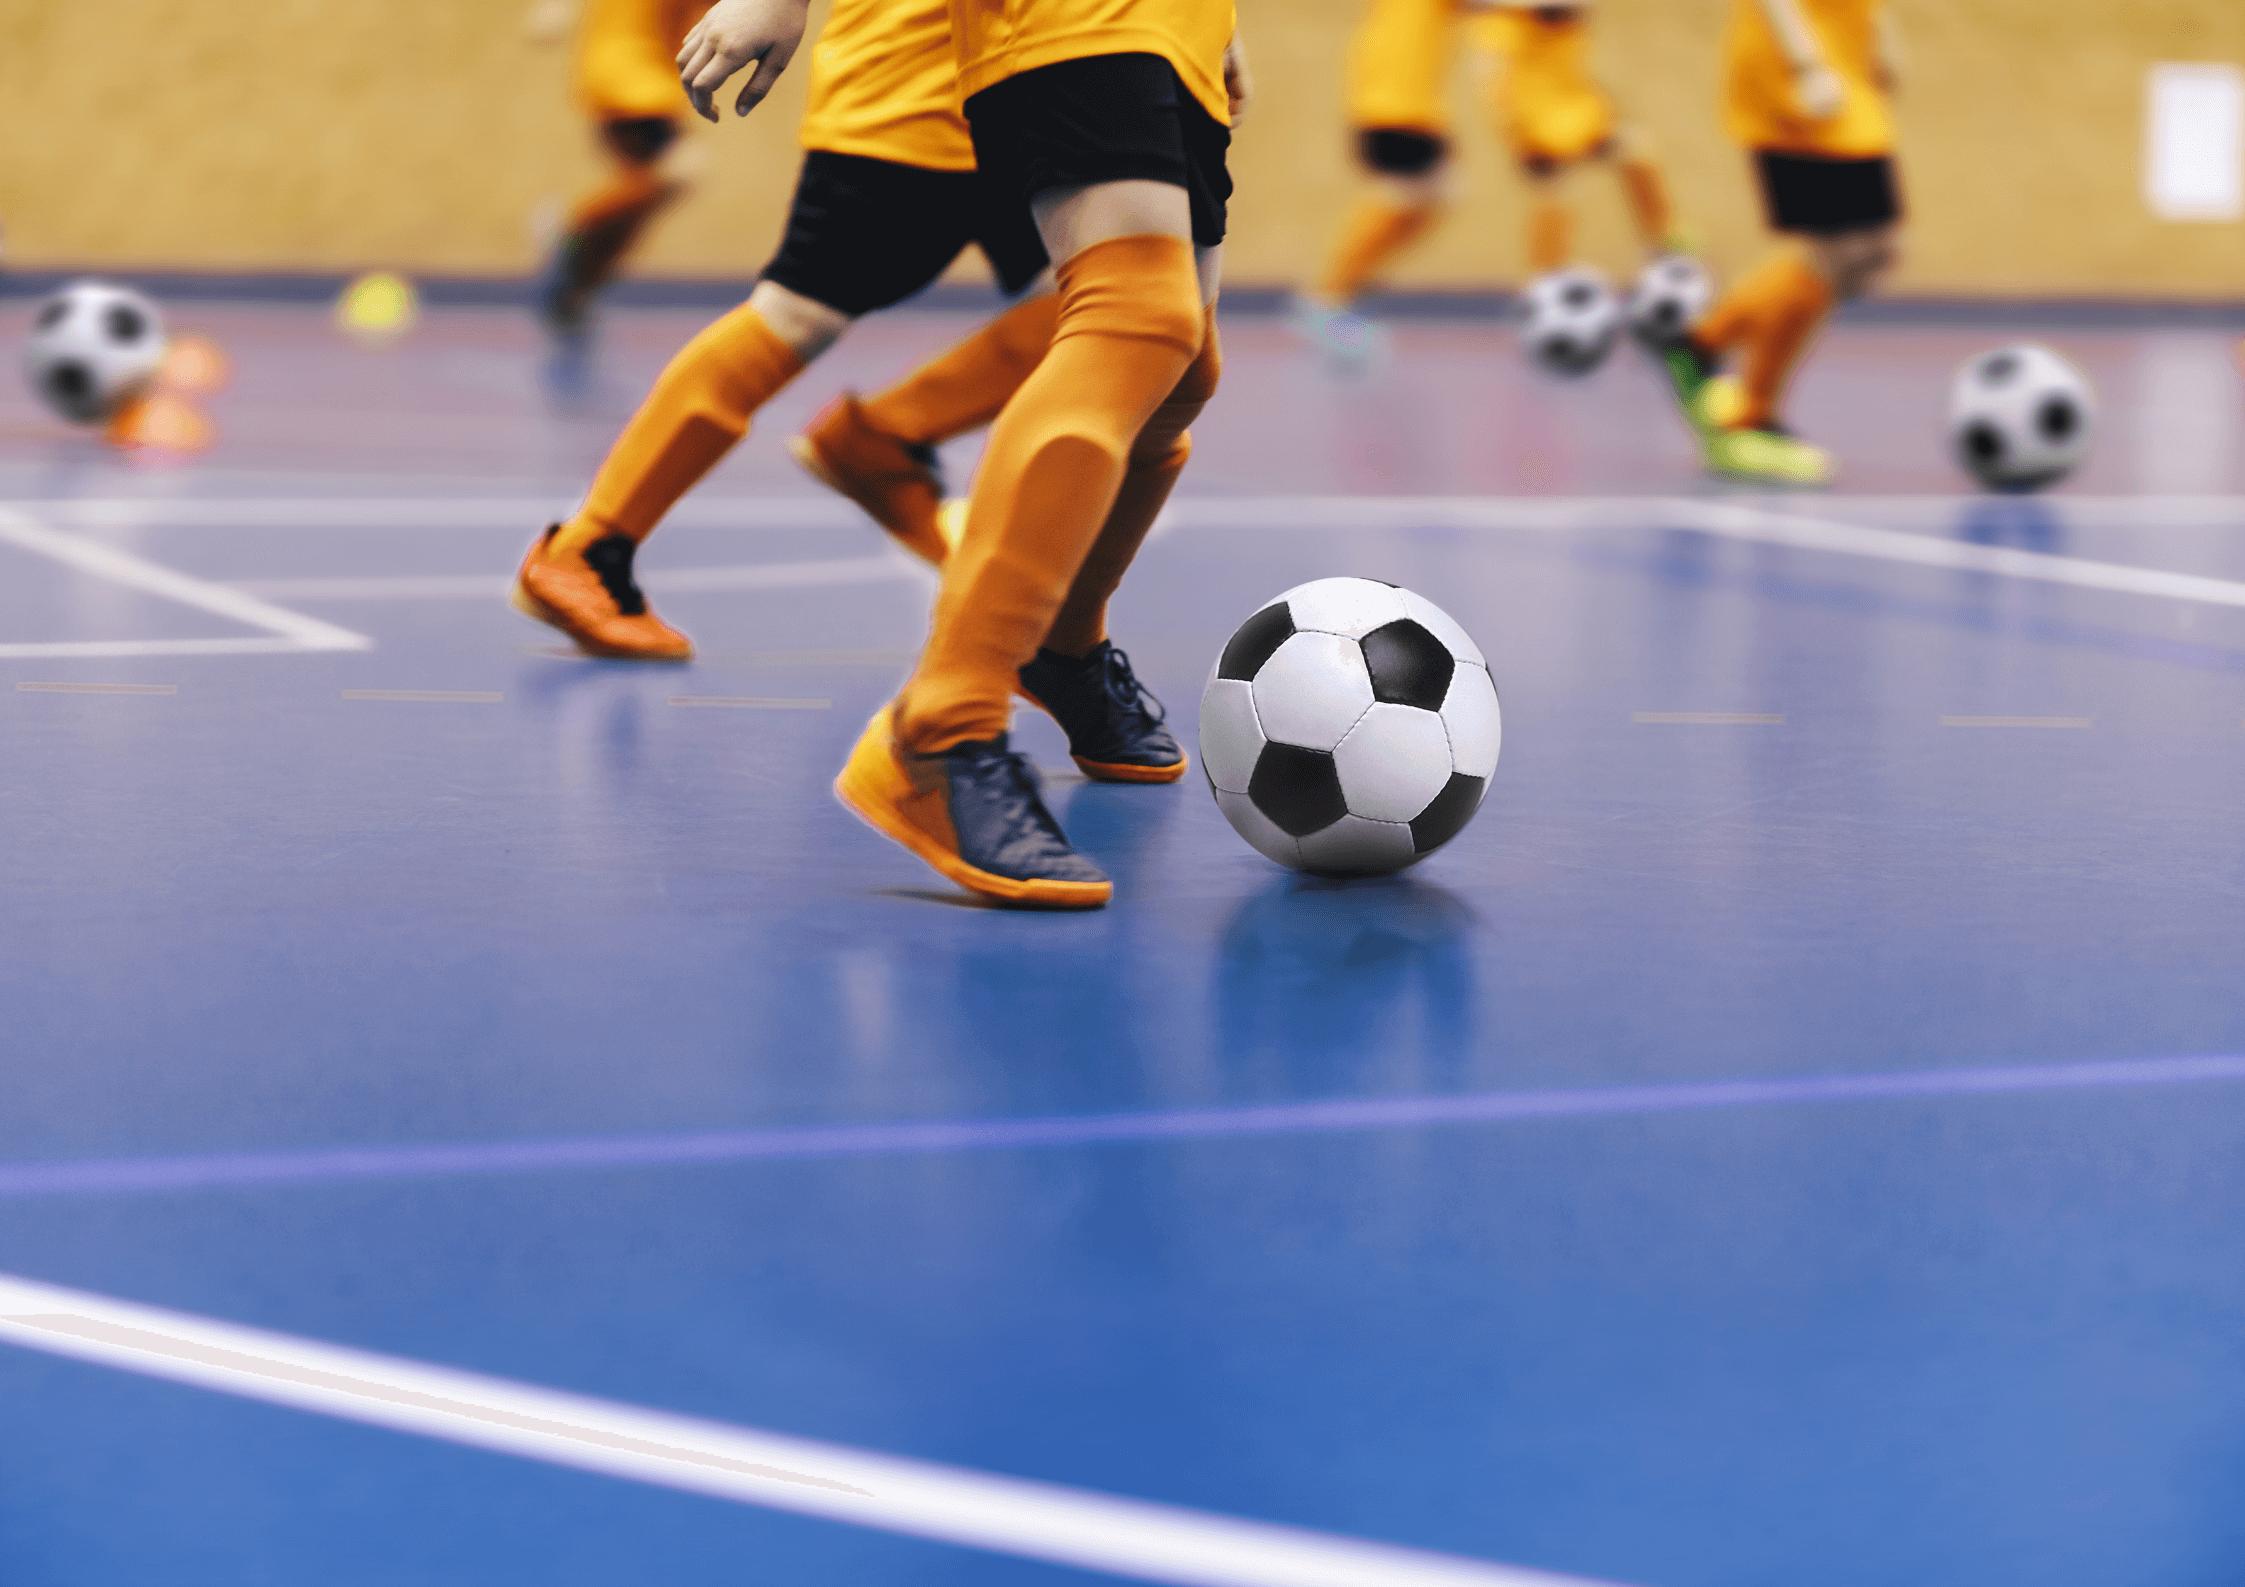 Futsal Refereeing Course